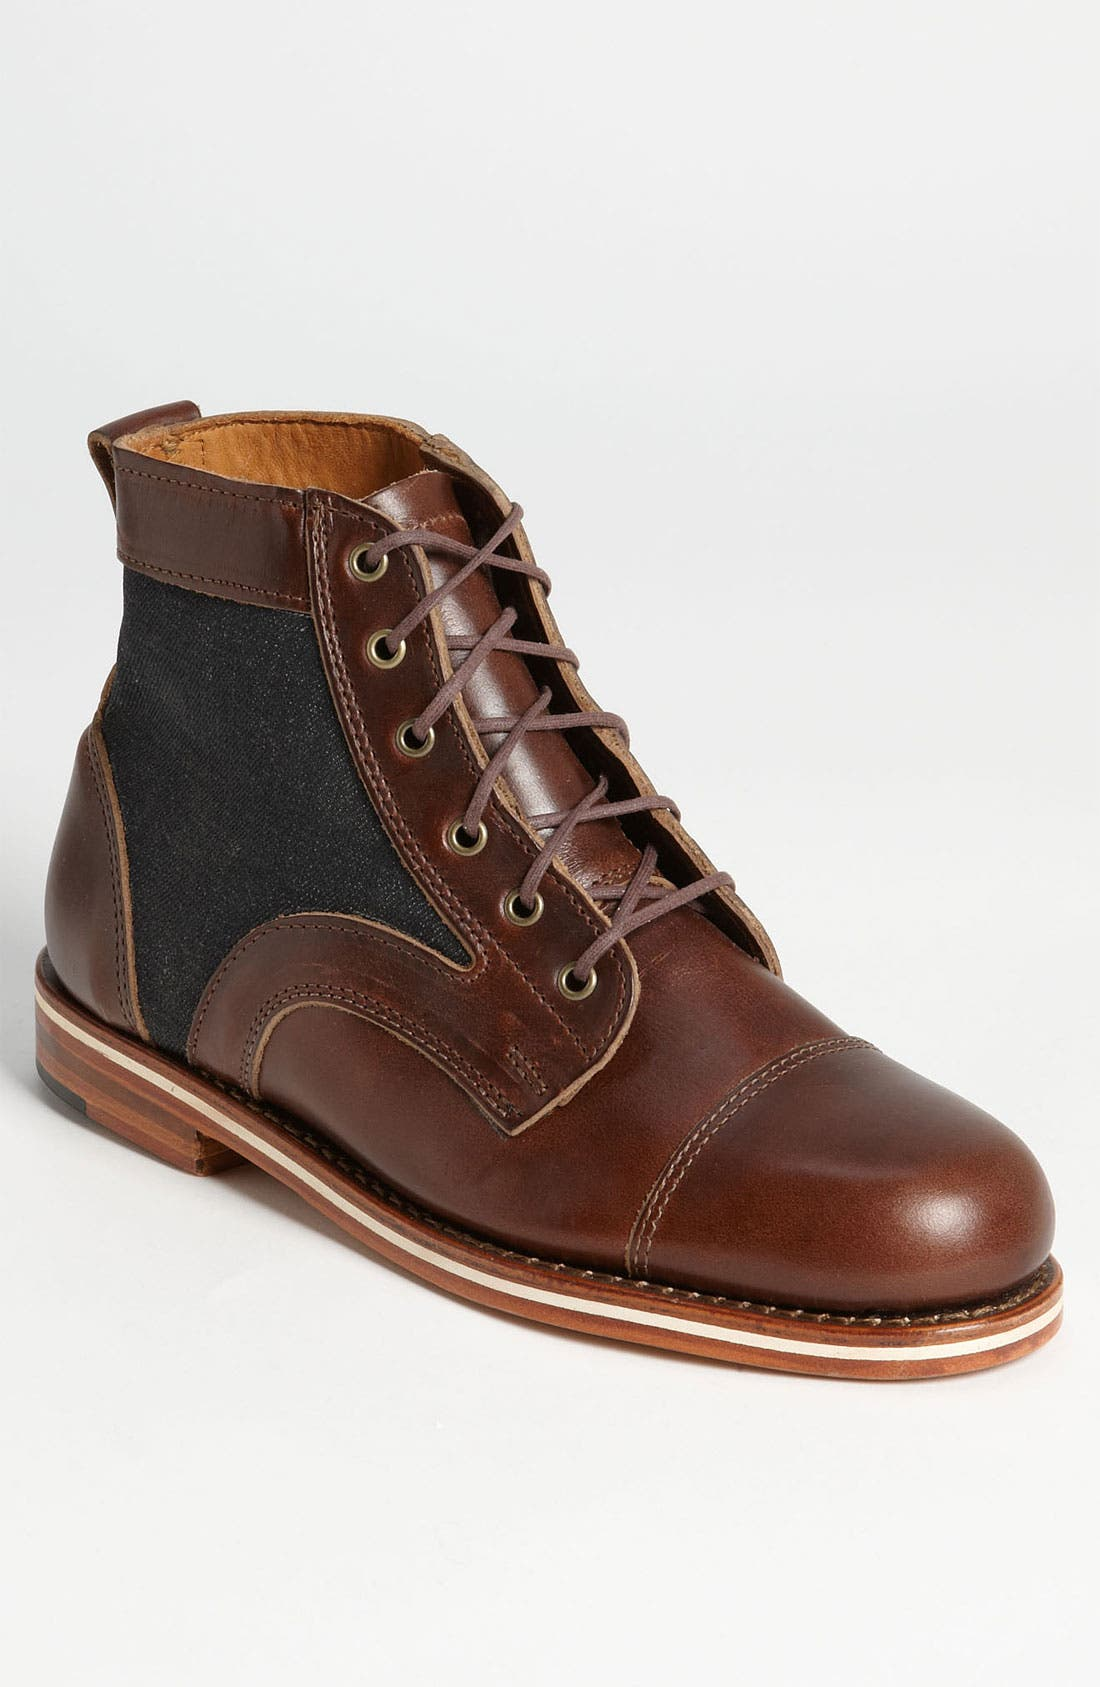 Alternate Image 1 Selected - HELM 'Reid' Cap Toe Boot